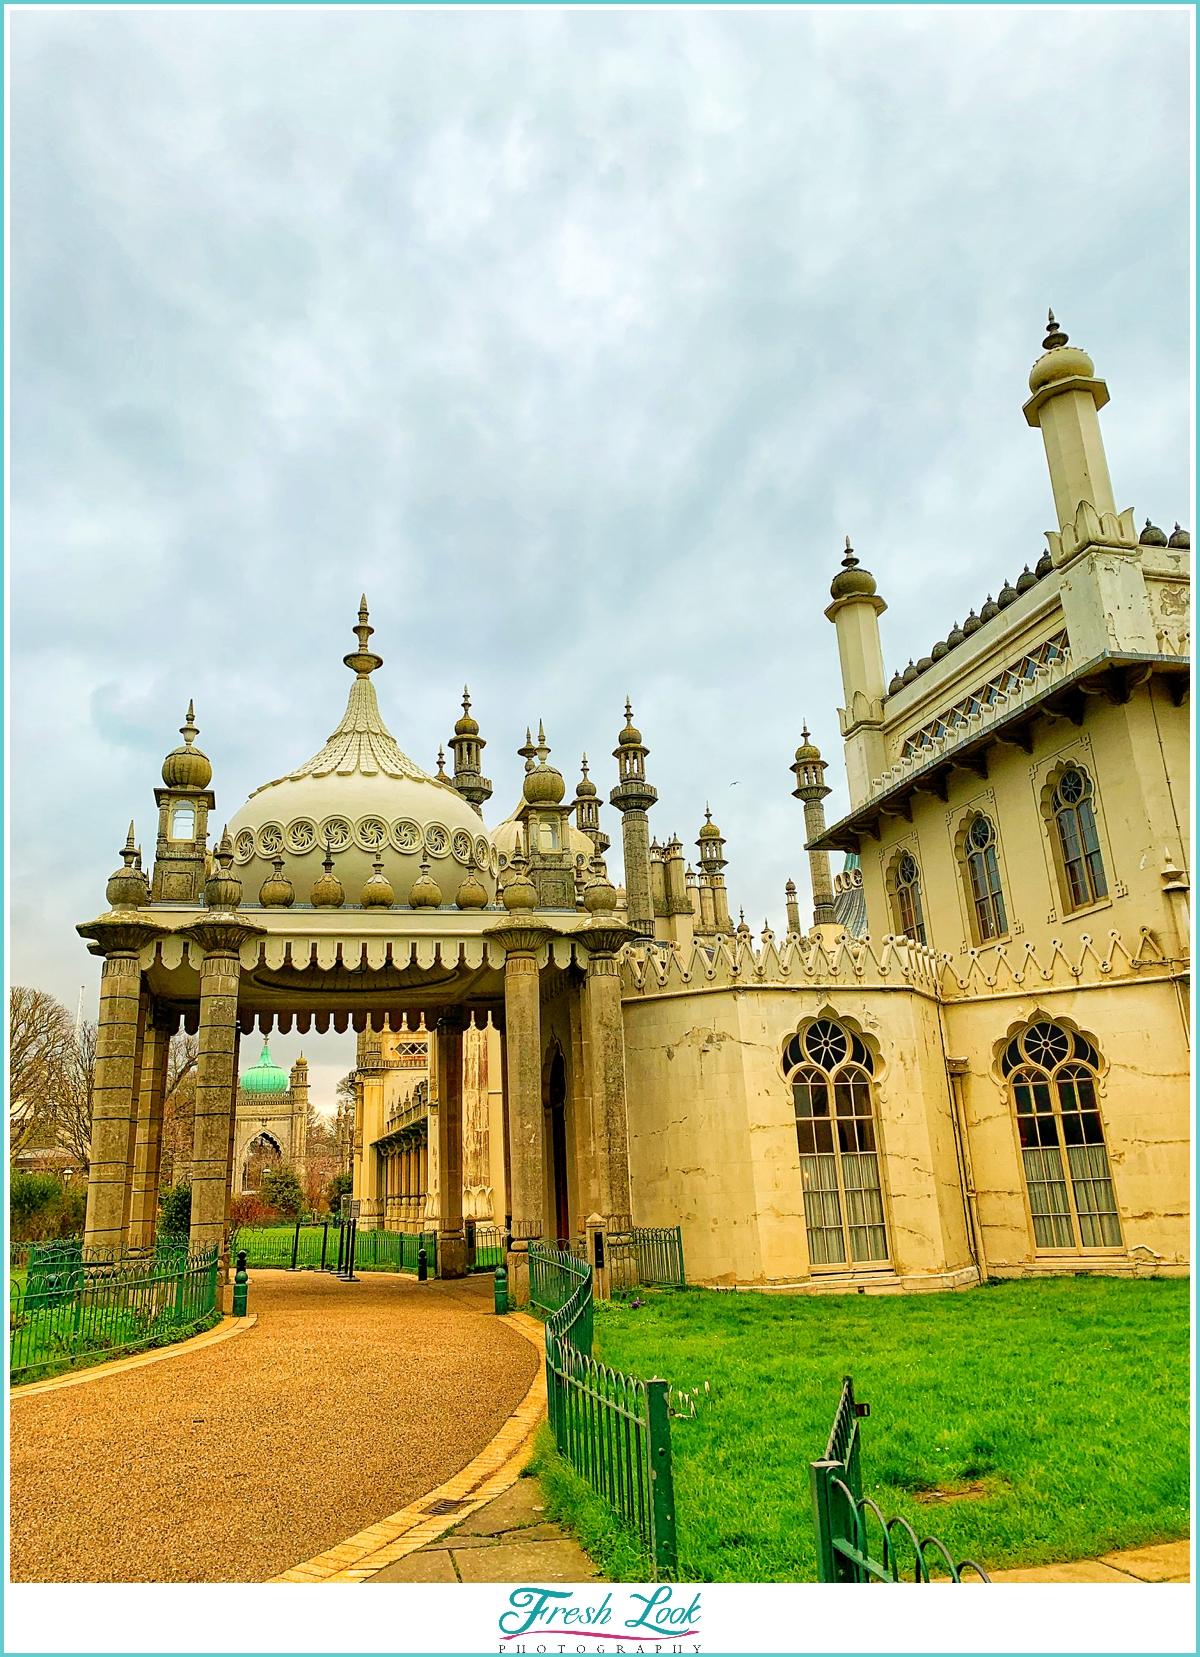 Royal Pavilion in Brighton England